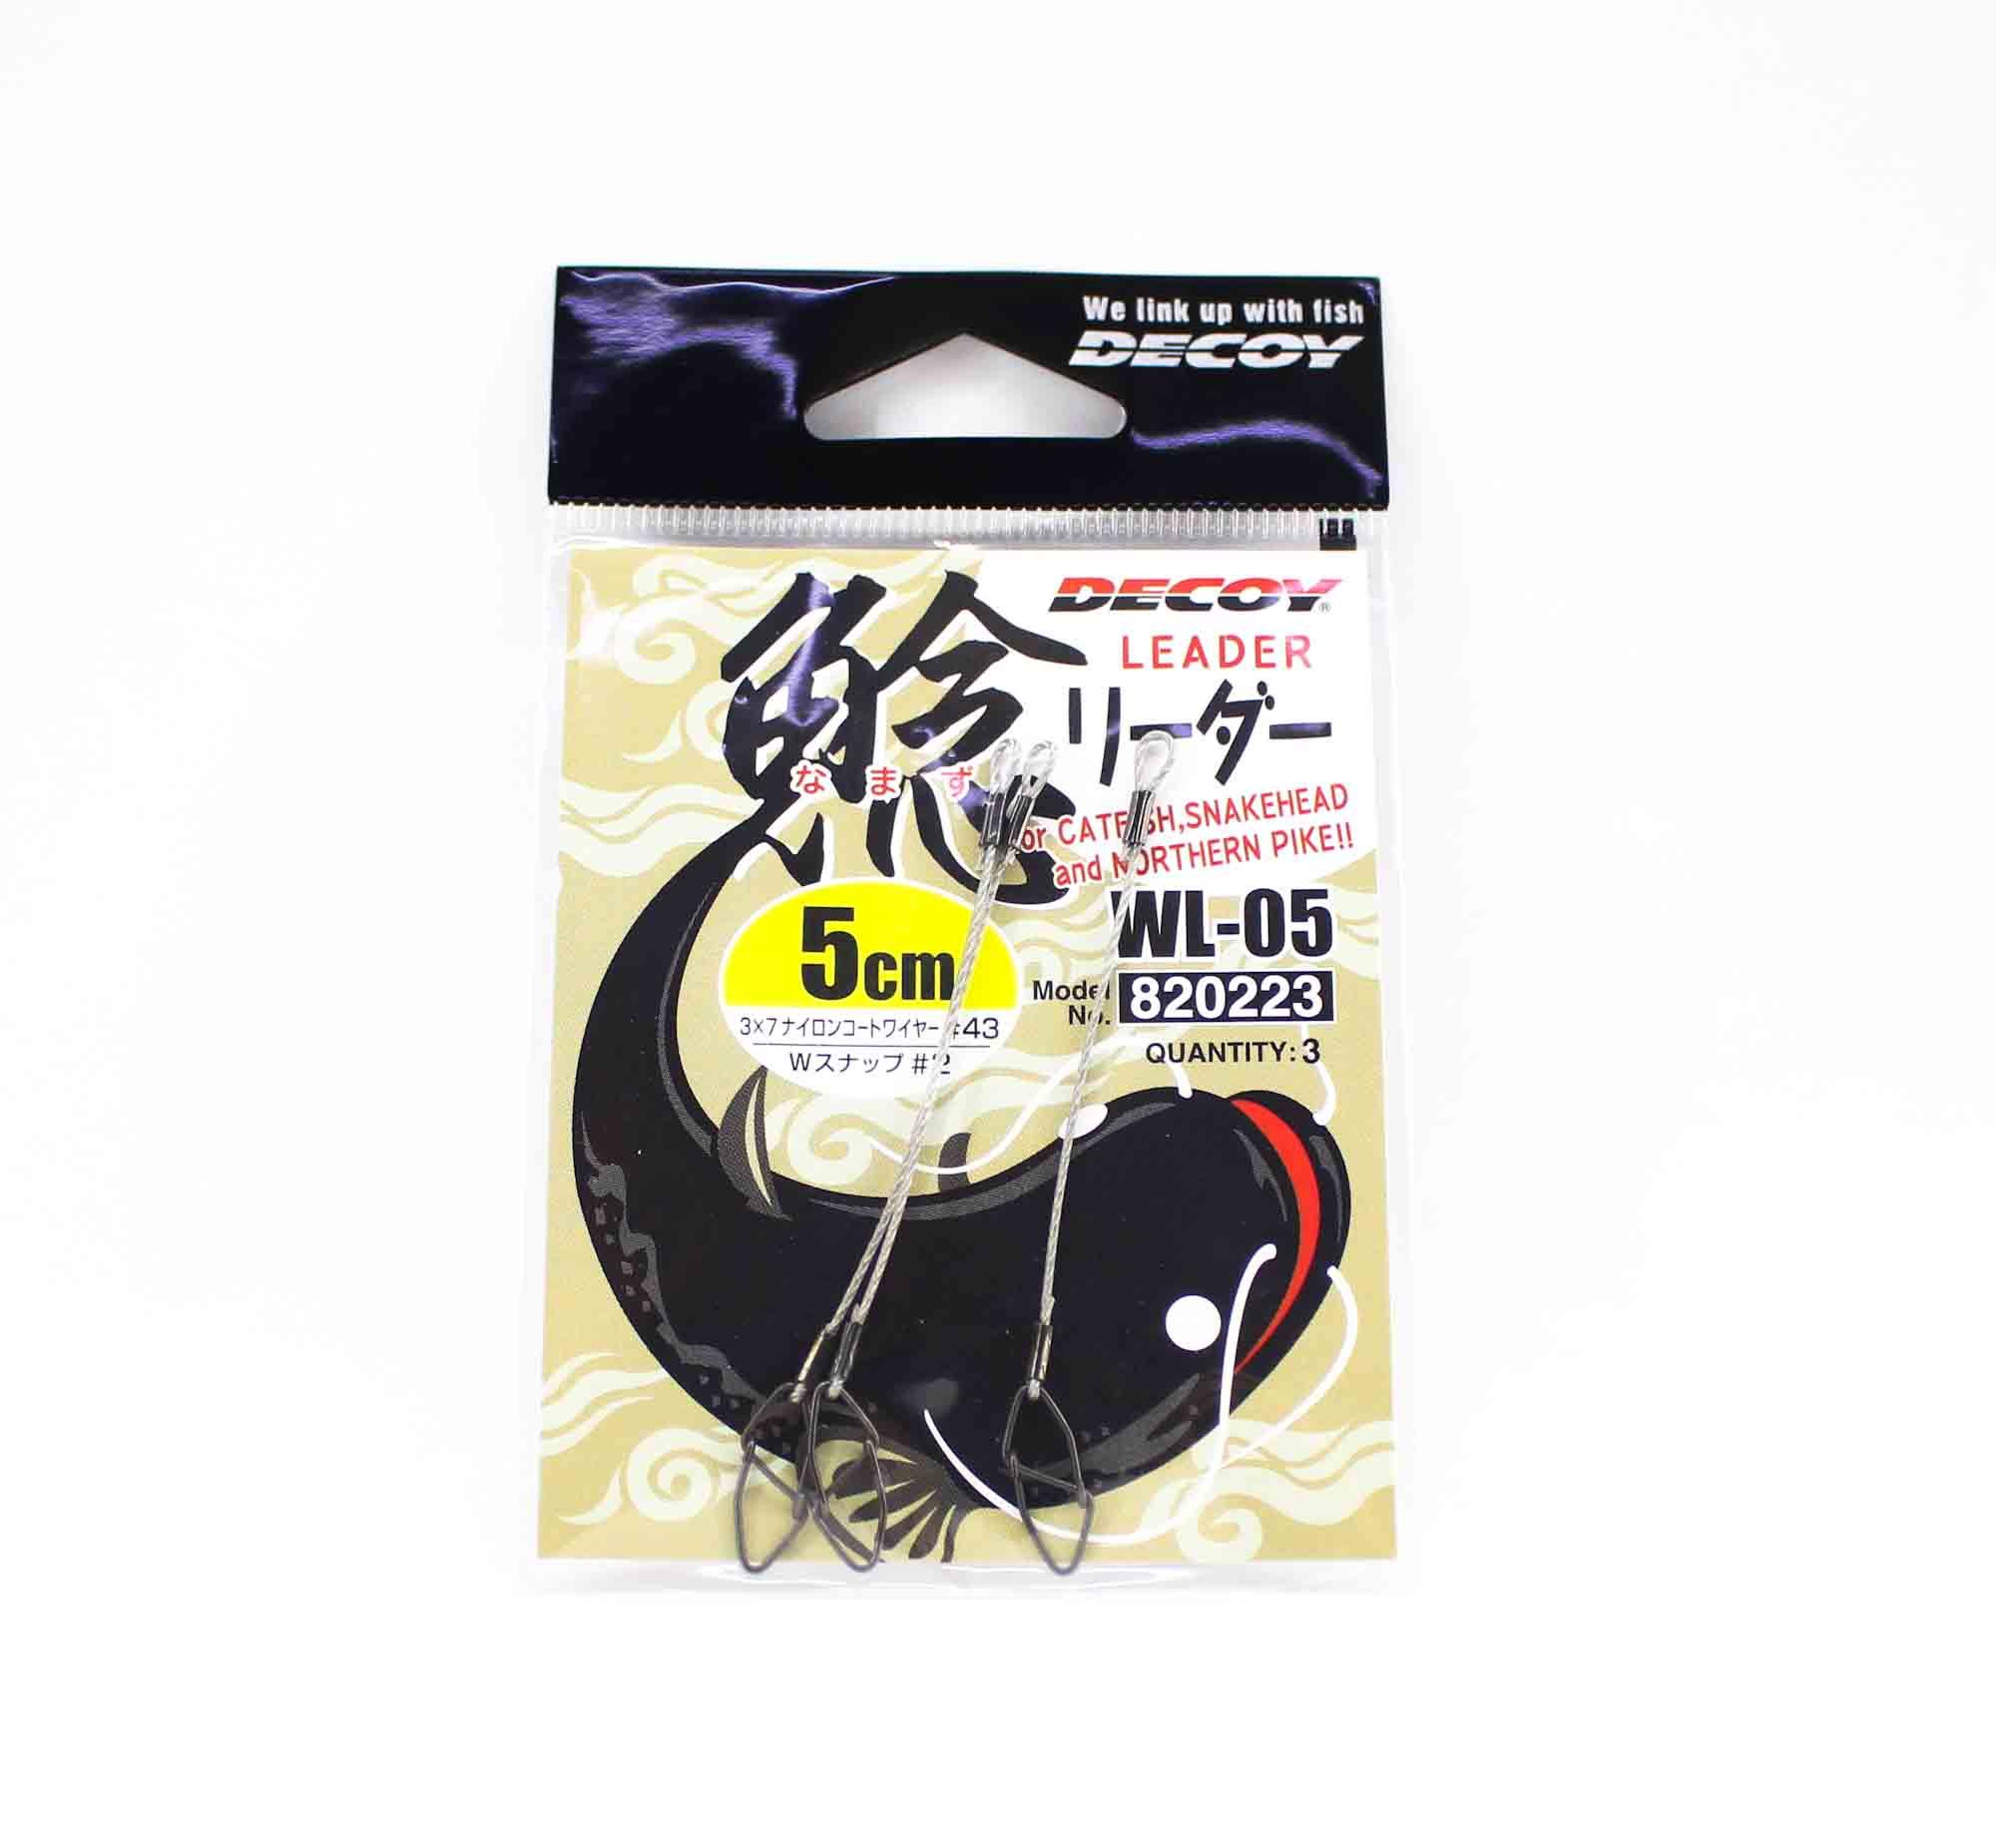 Decoy WL-05 Wire Leader 5cm #43 Snap Size 2 (0223)